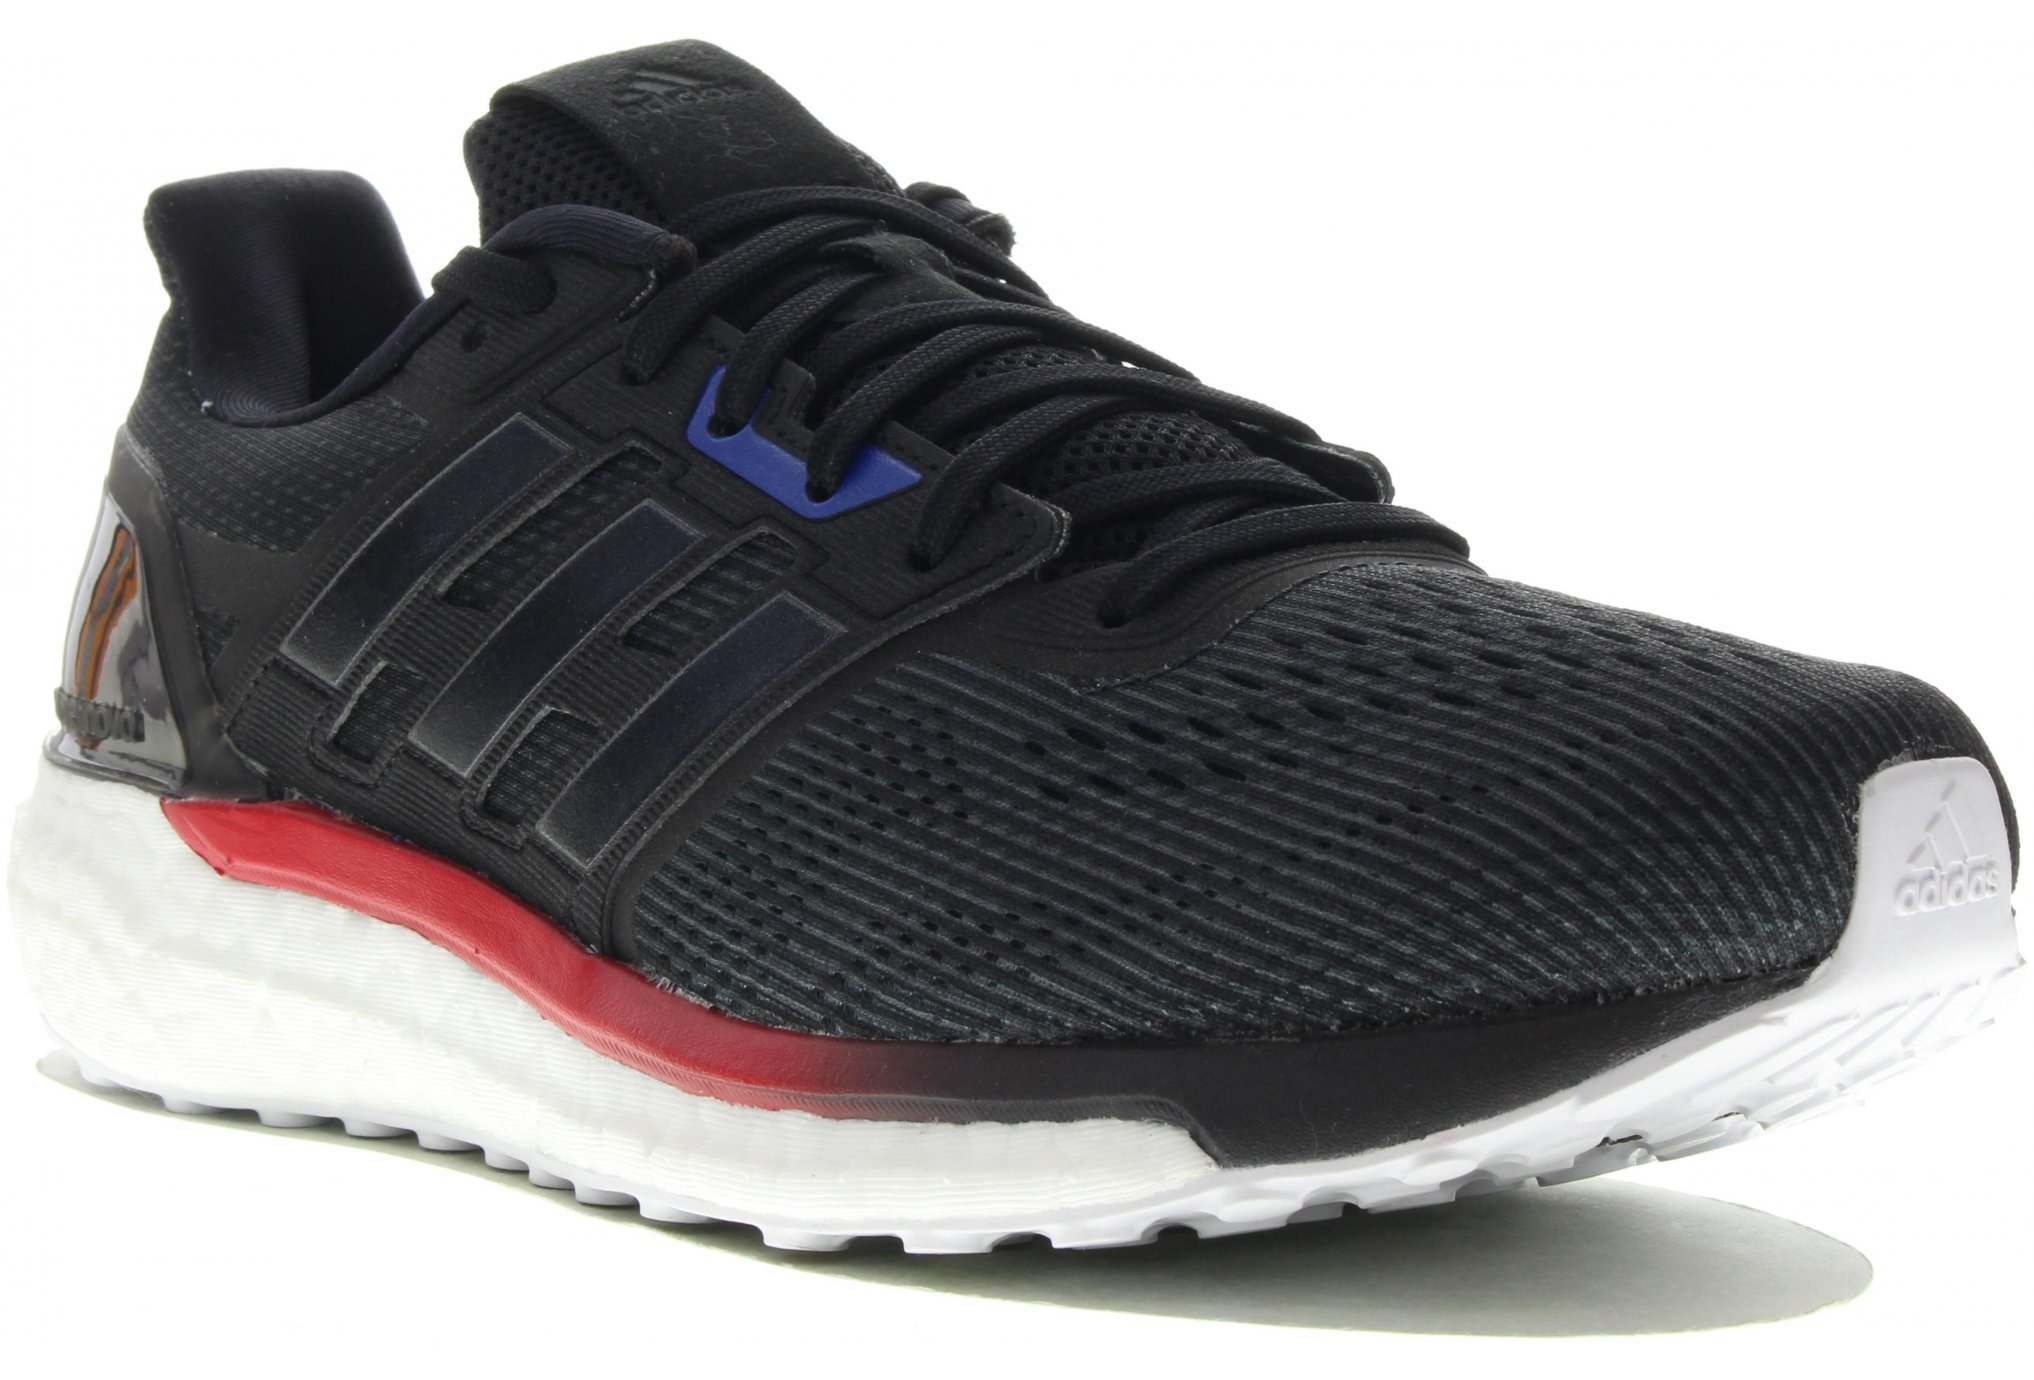 Adidas Supernova aktiv m chaussures homme